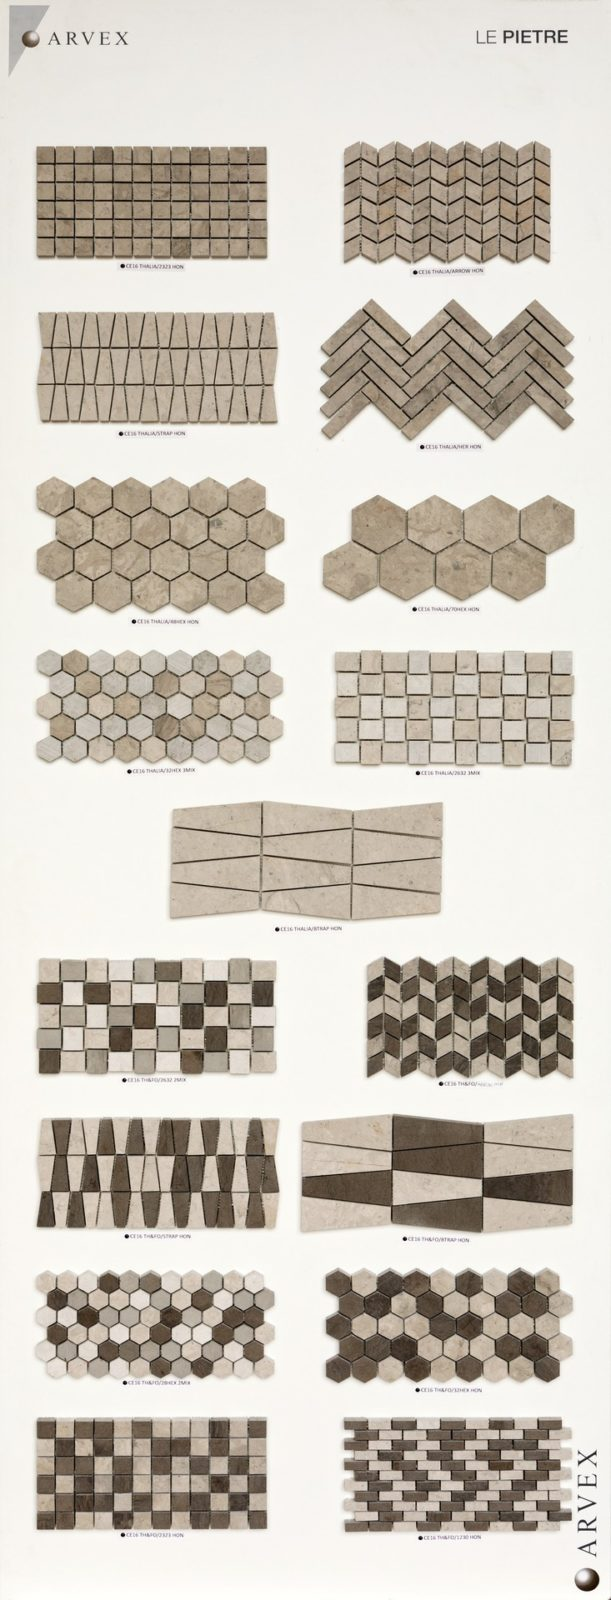 Mosaico - Le Pietre 02